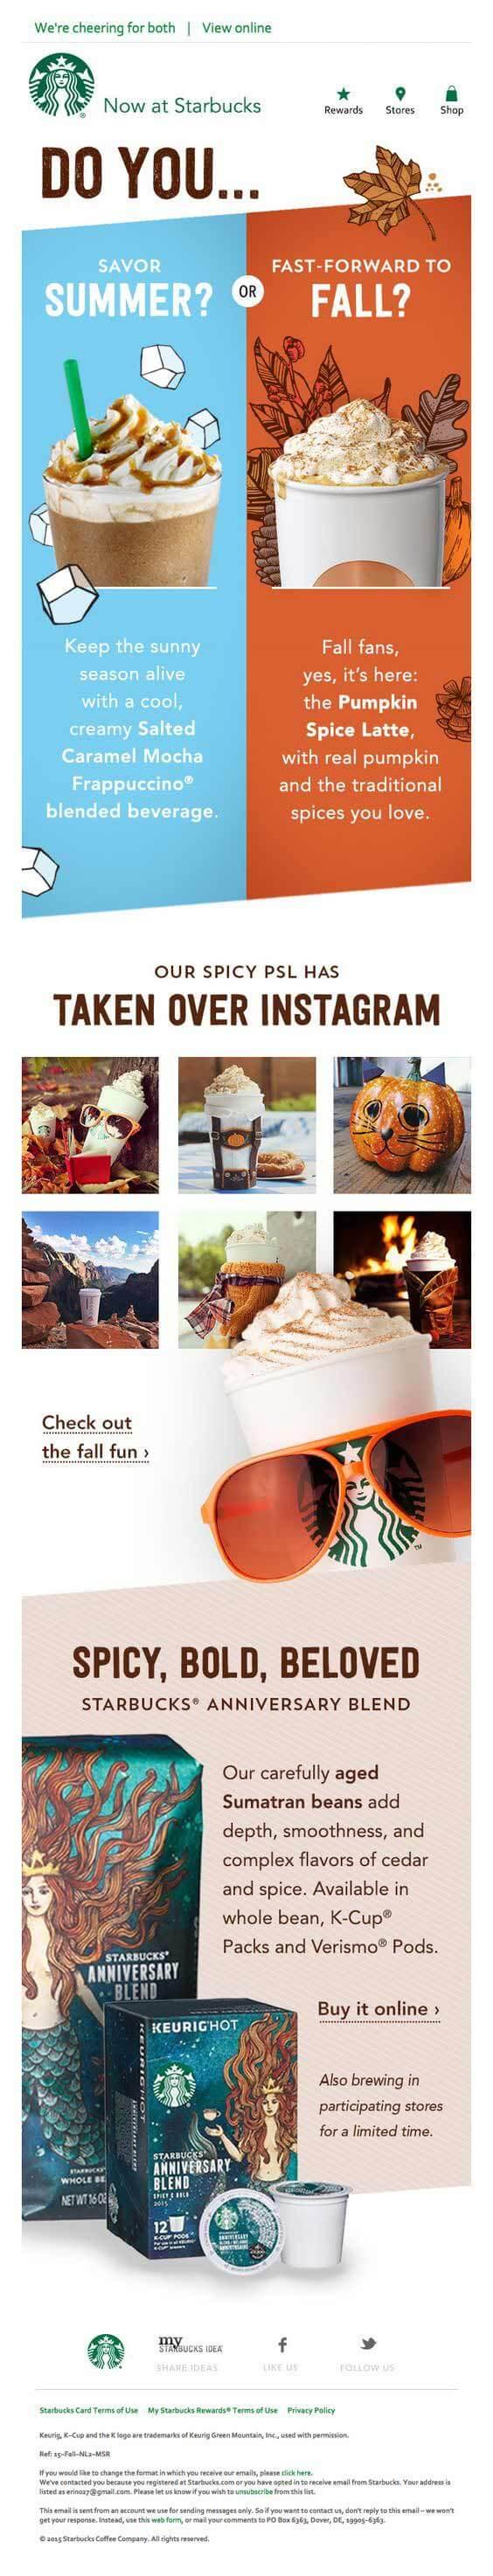 Seasonal Email Templates_Starbucks_summer-fall